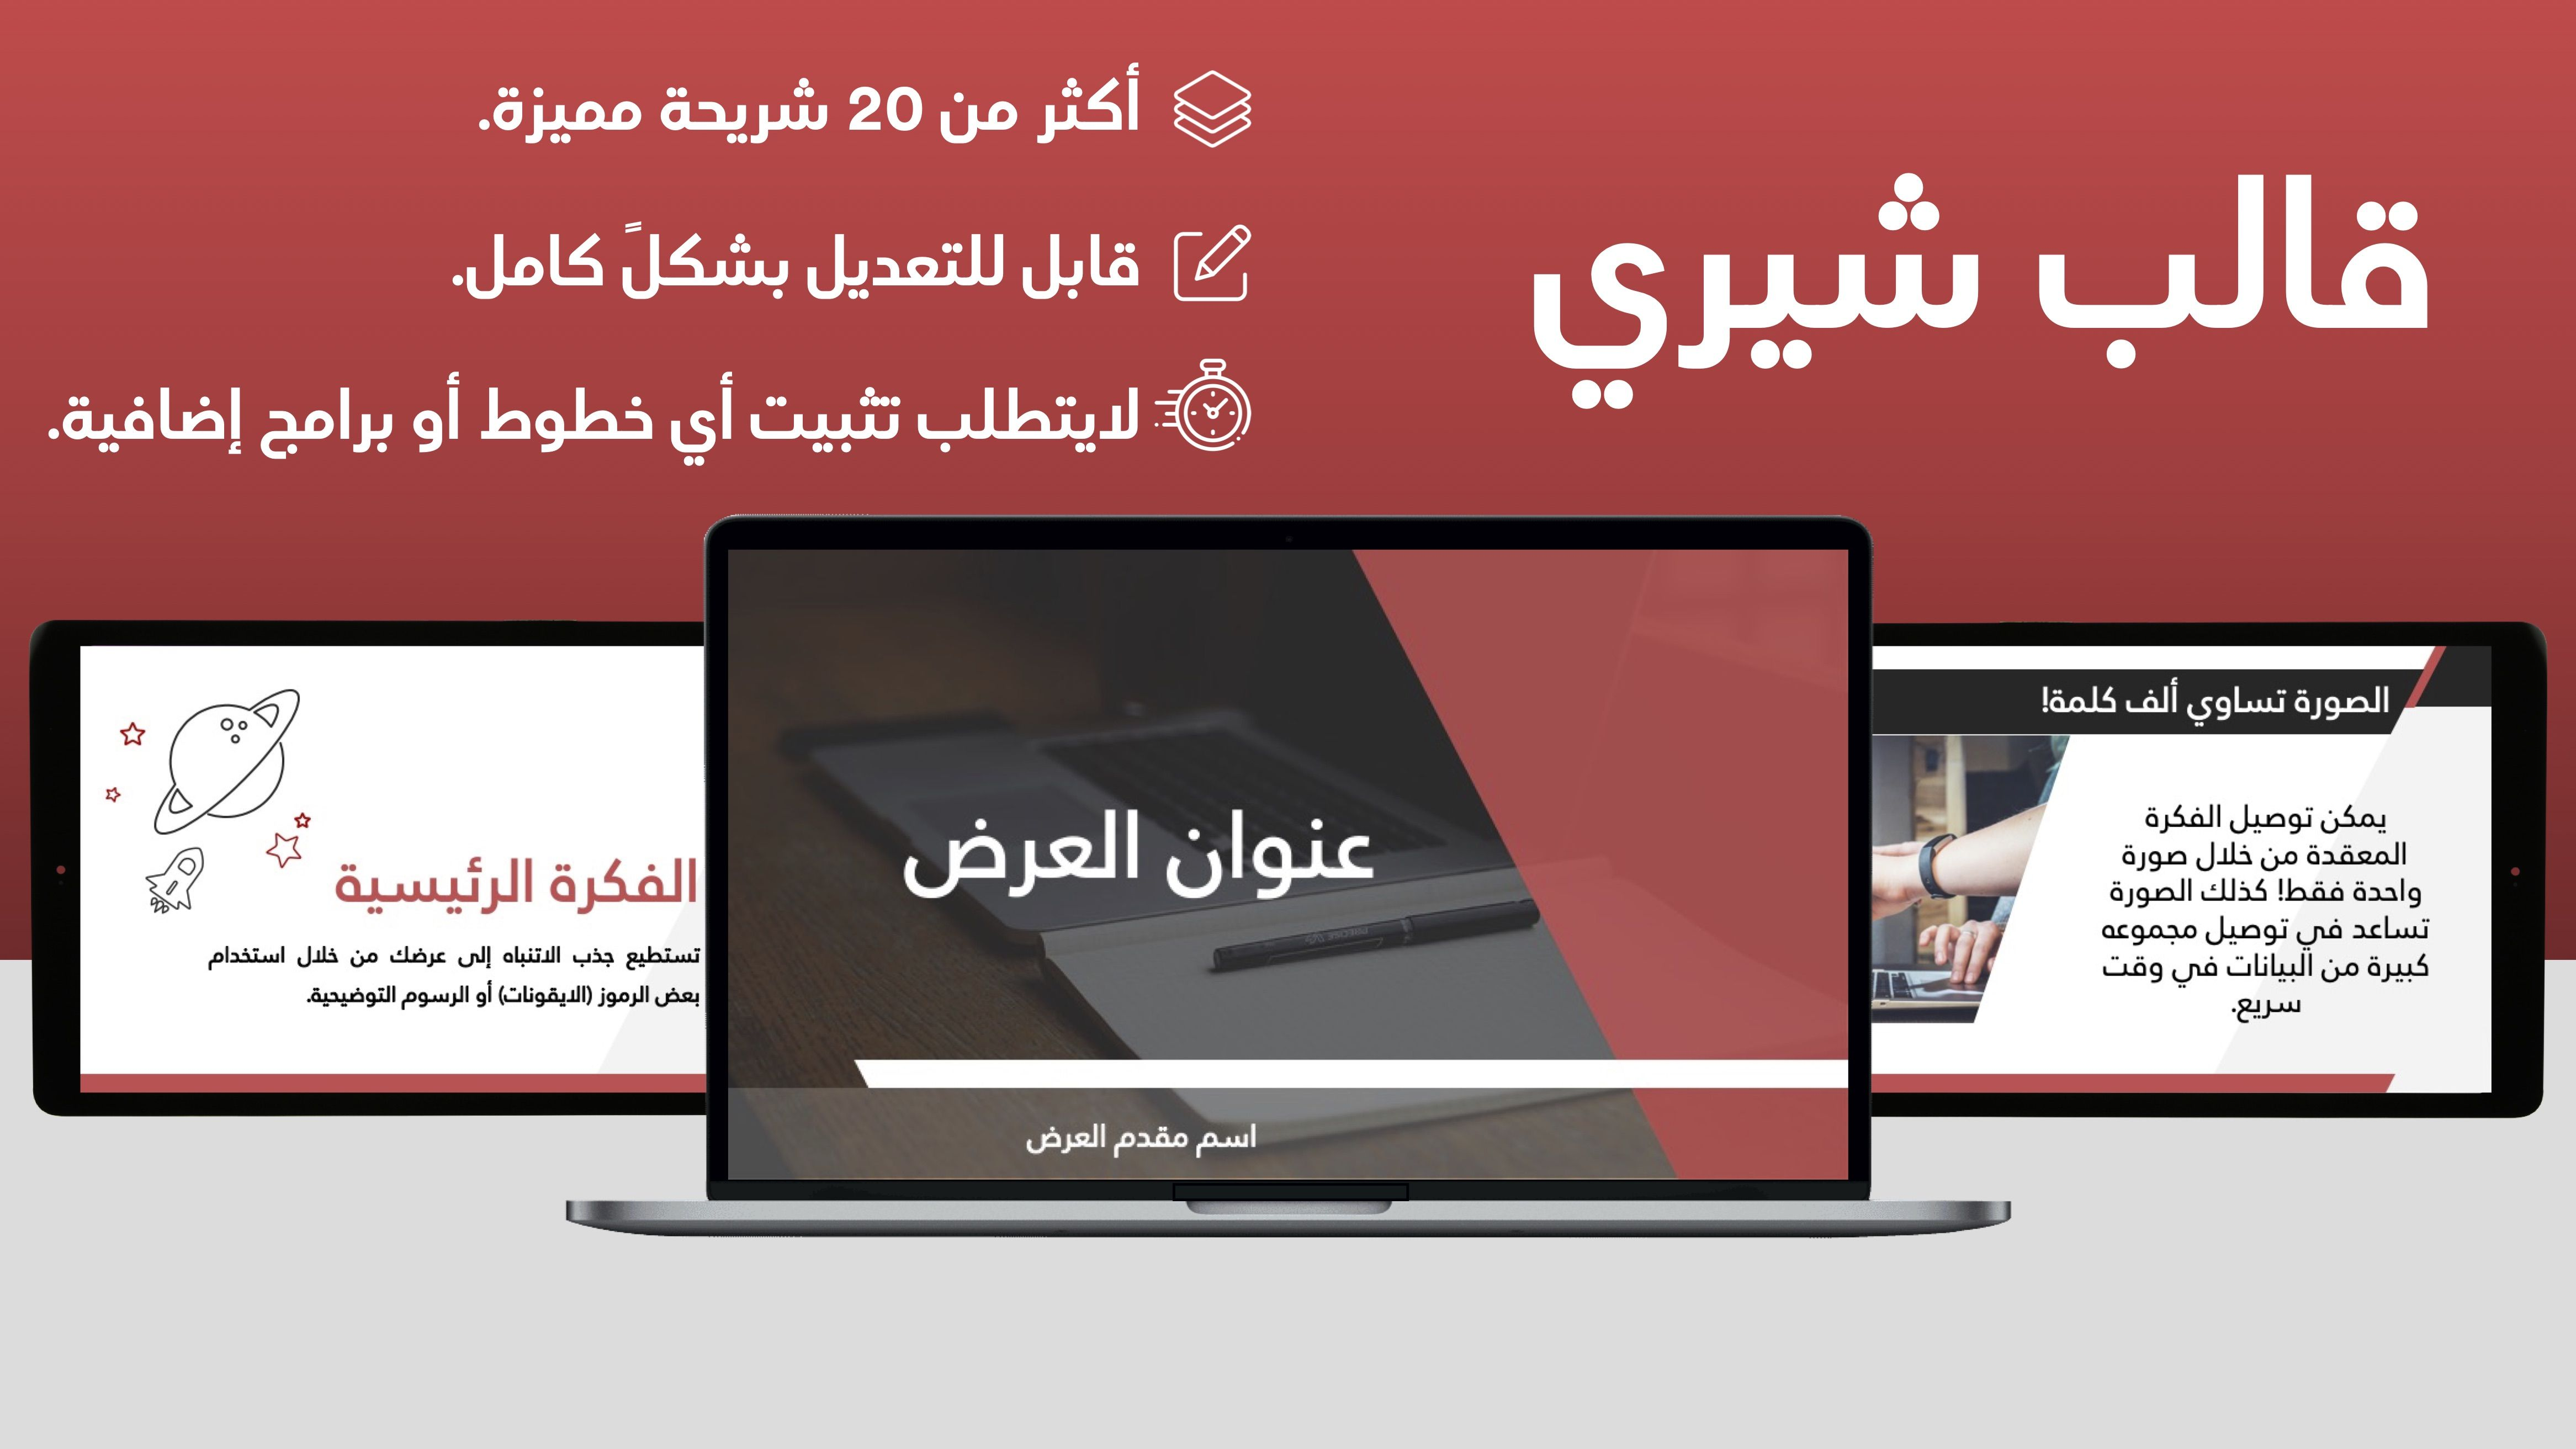 عرض بوربوينت عربي احمر احترافي مفرغ Electronics Phone